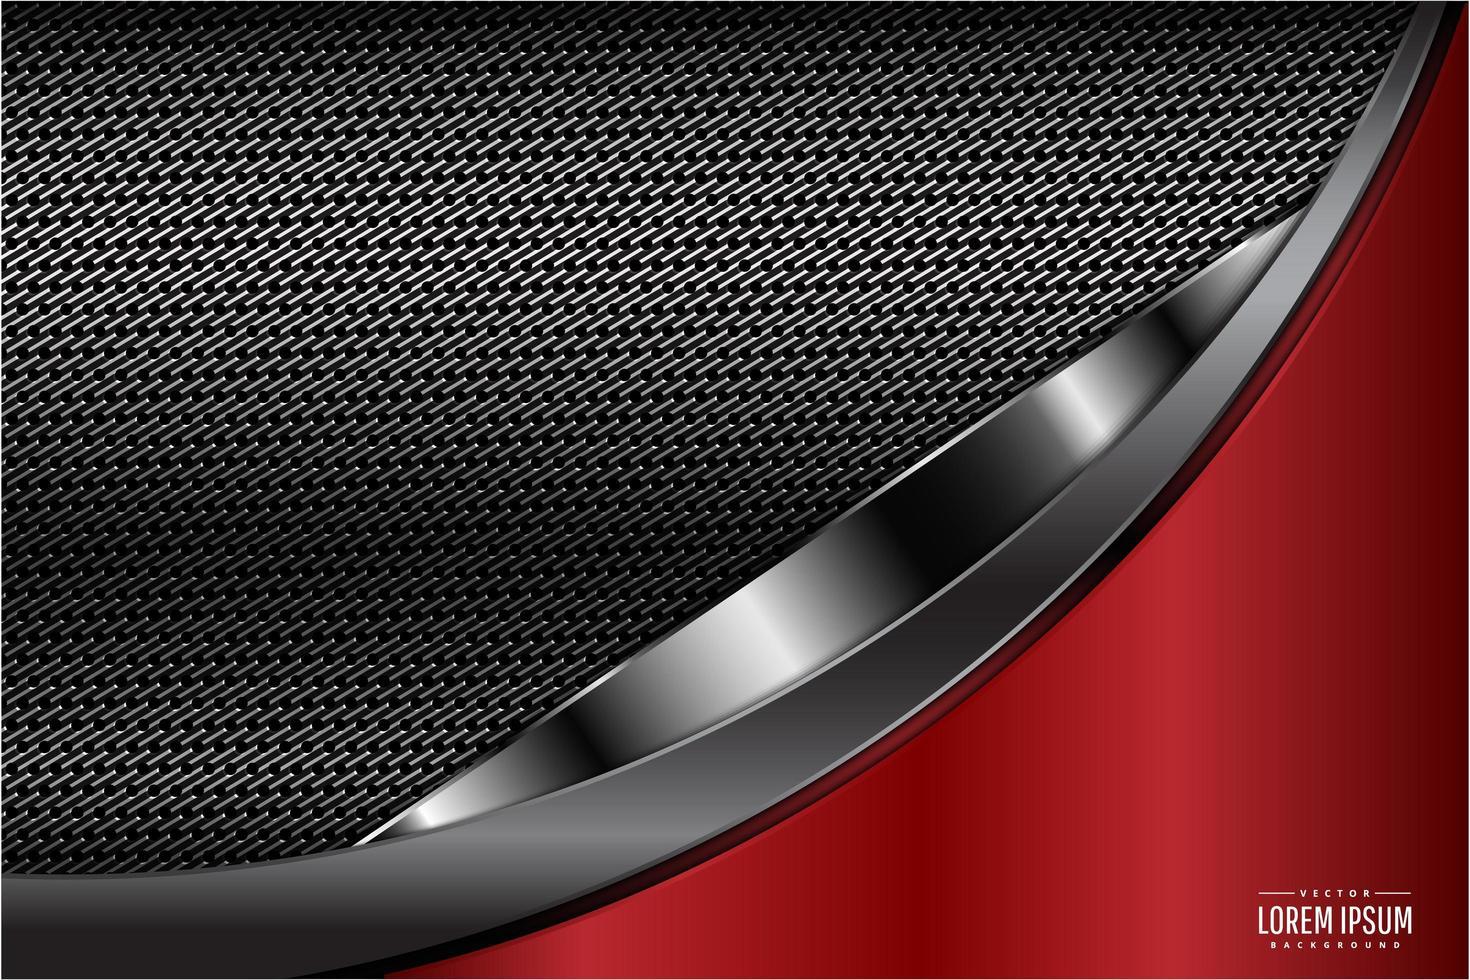 rode technologie gebogen ontwerp achtergrond vector